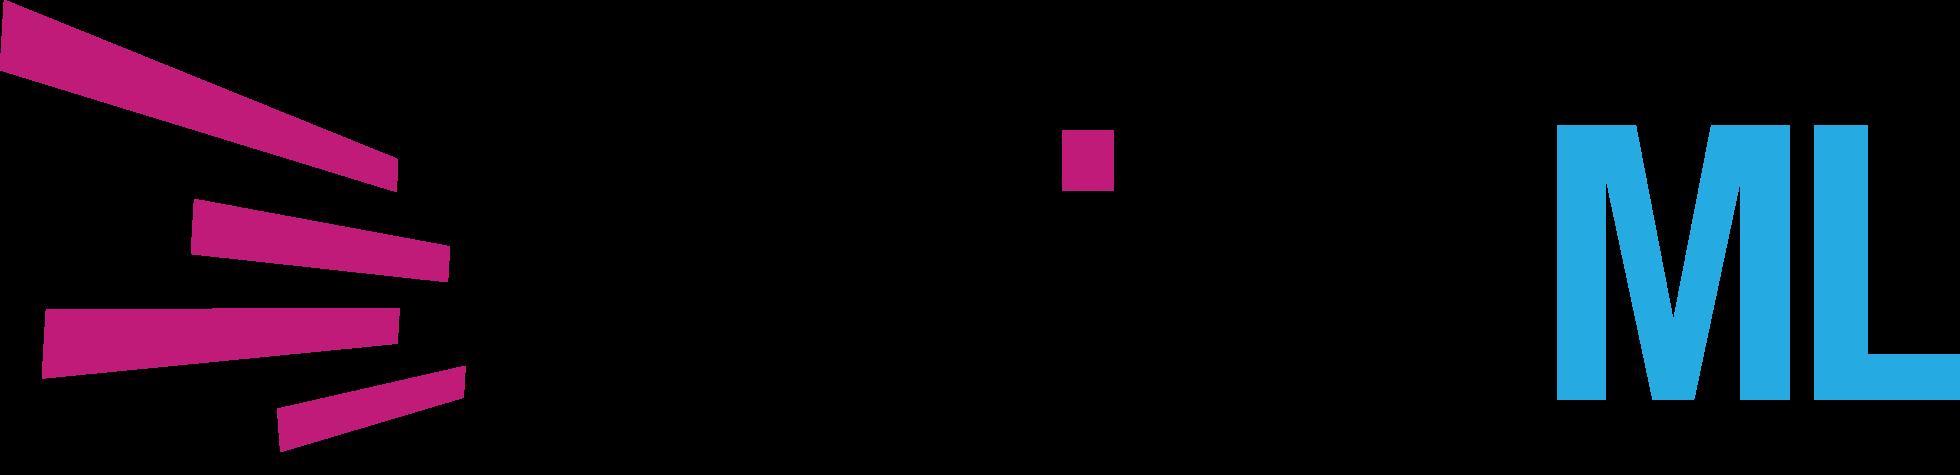 SpringML Logo